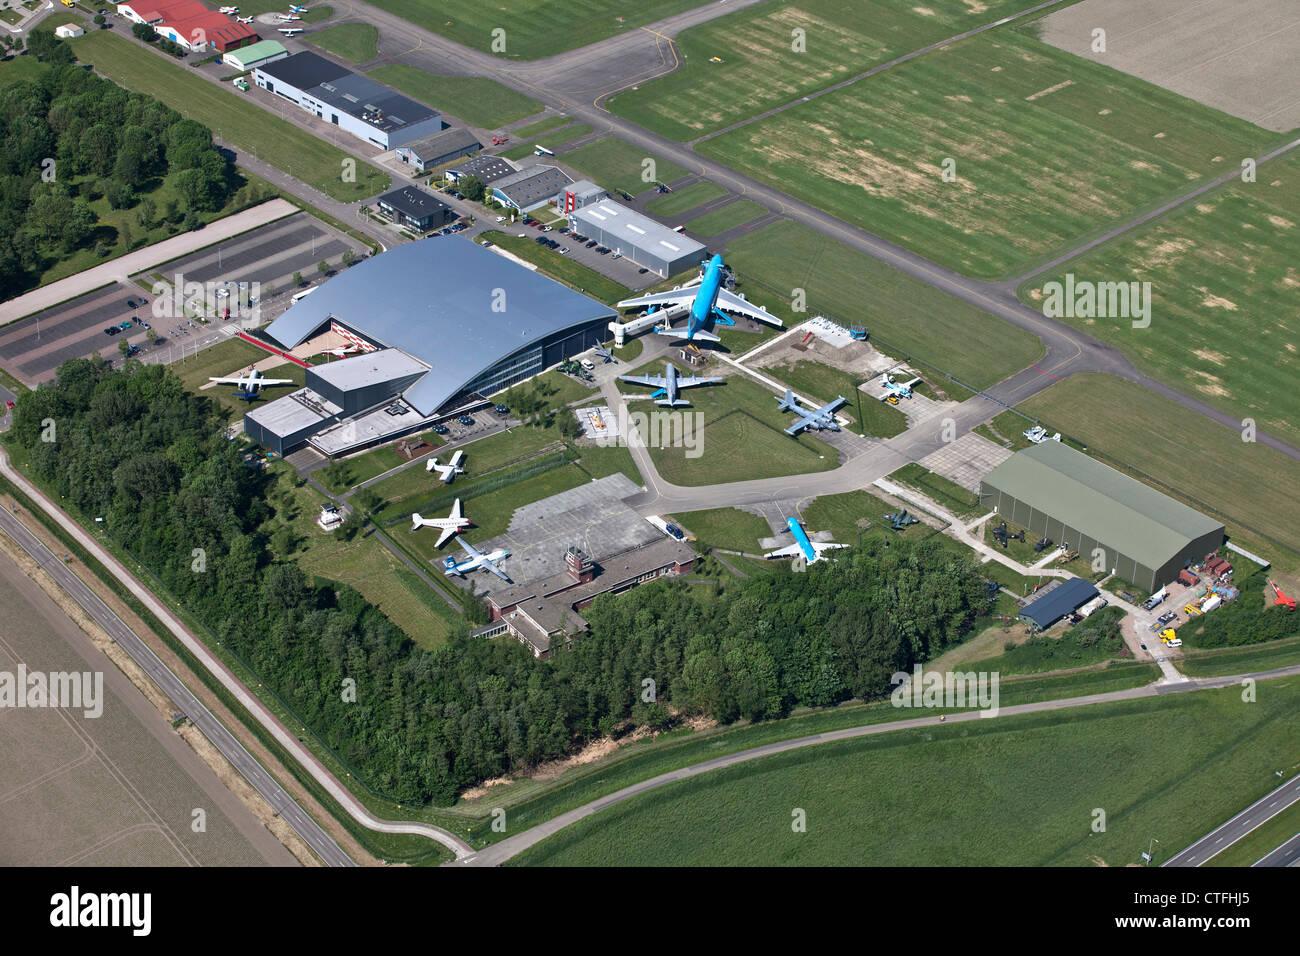 The Netherlands, Lelystad, Airplane museum called Aviodrome. Aerial. - Stock Image